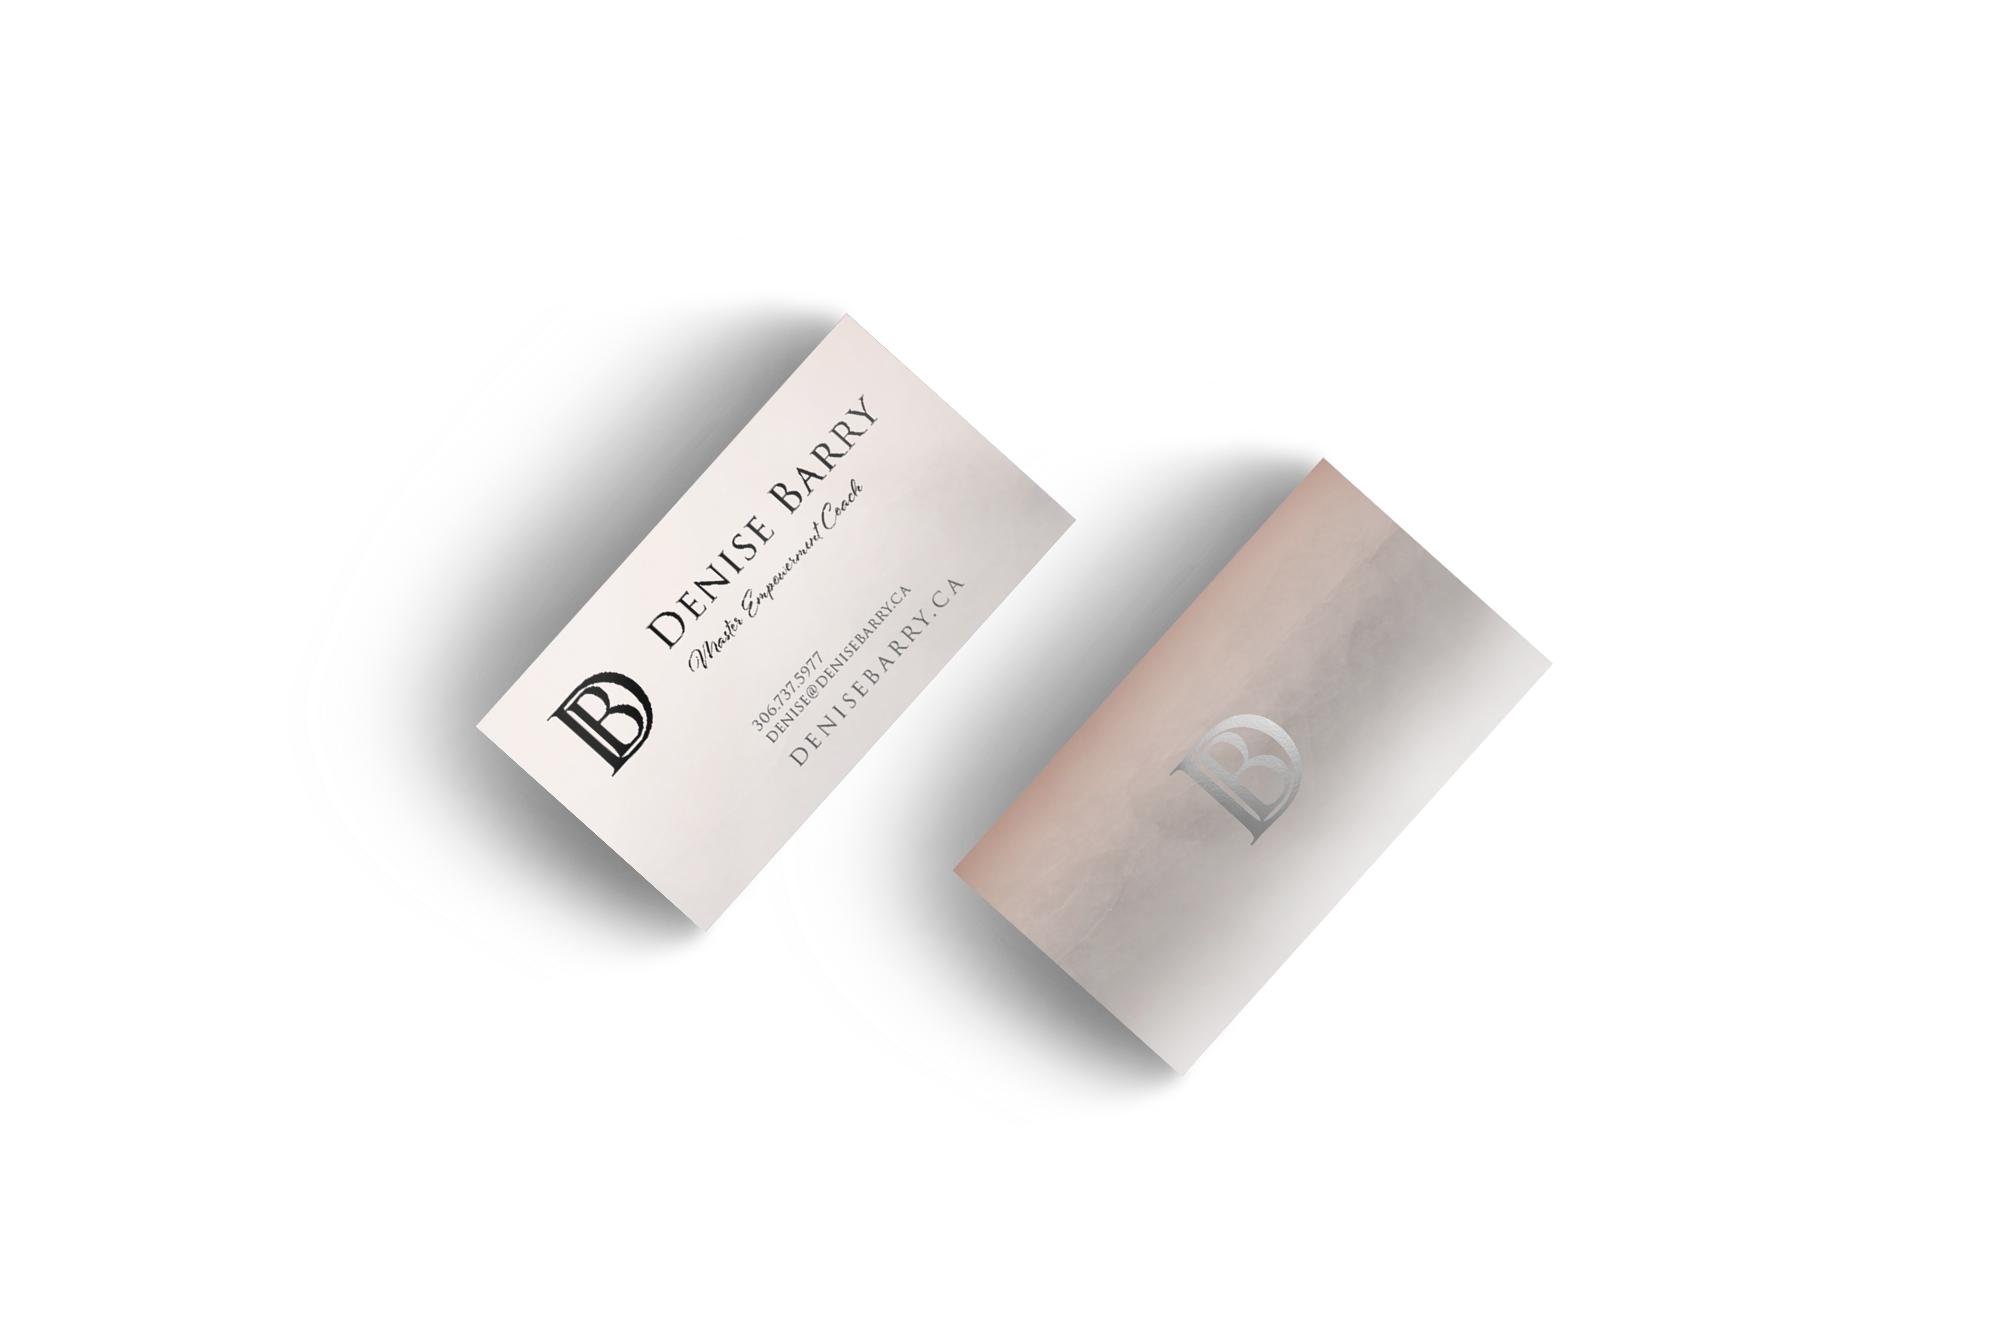 Denise Barry Business Card